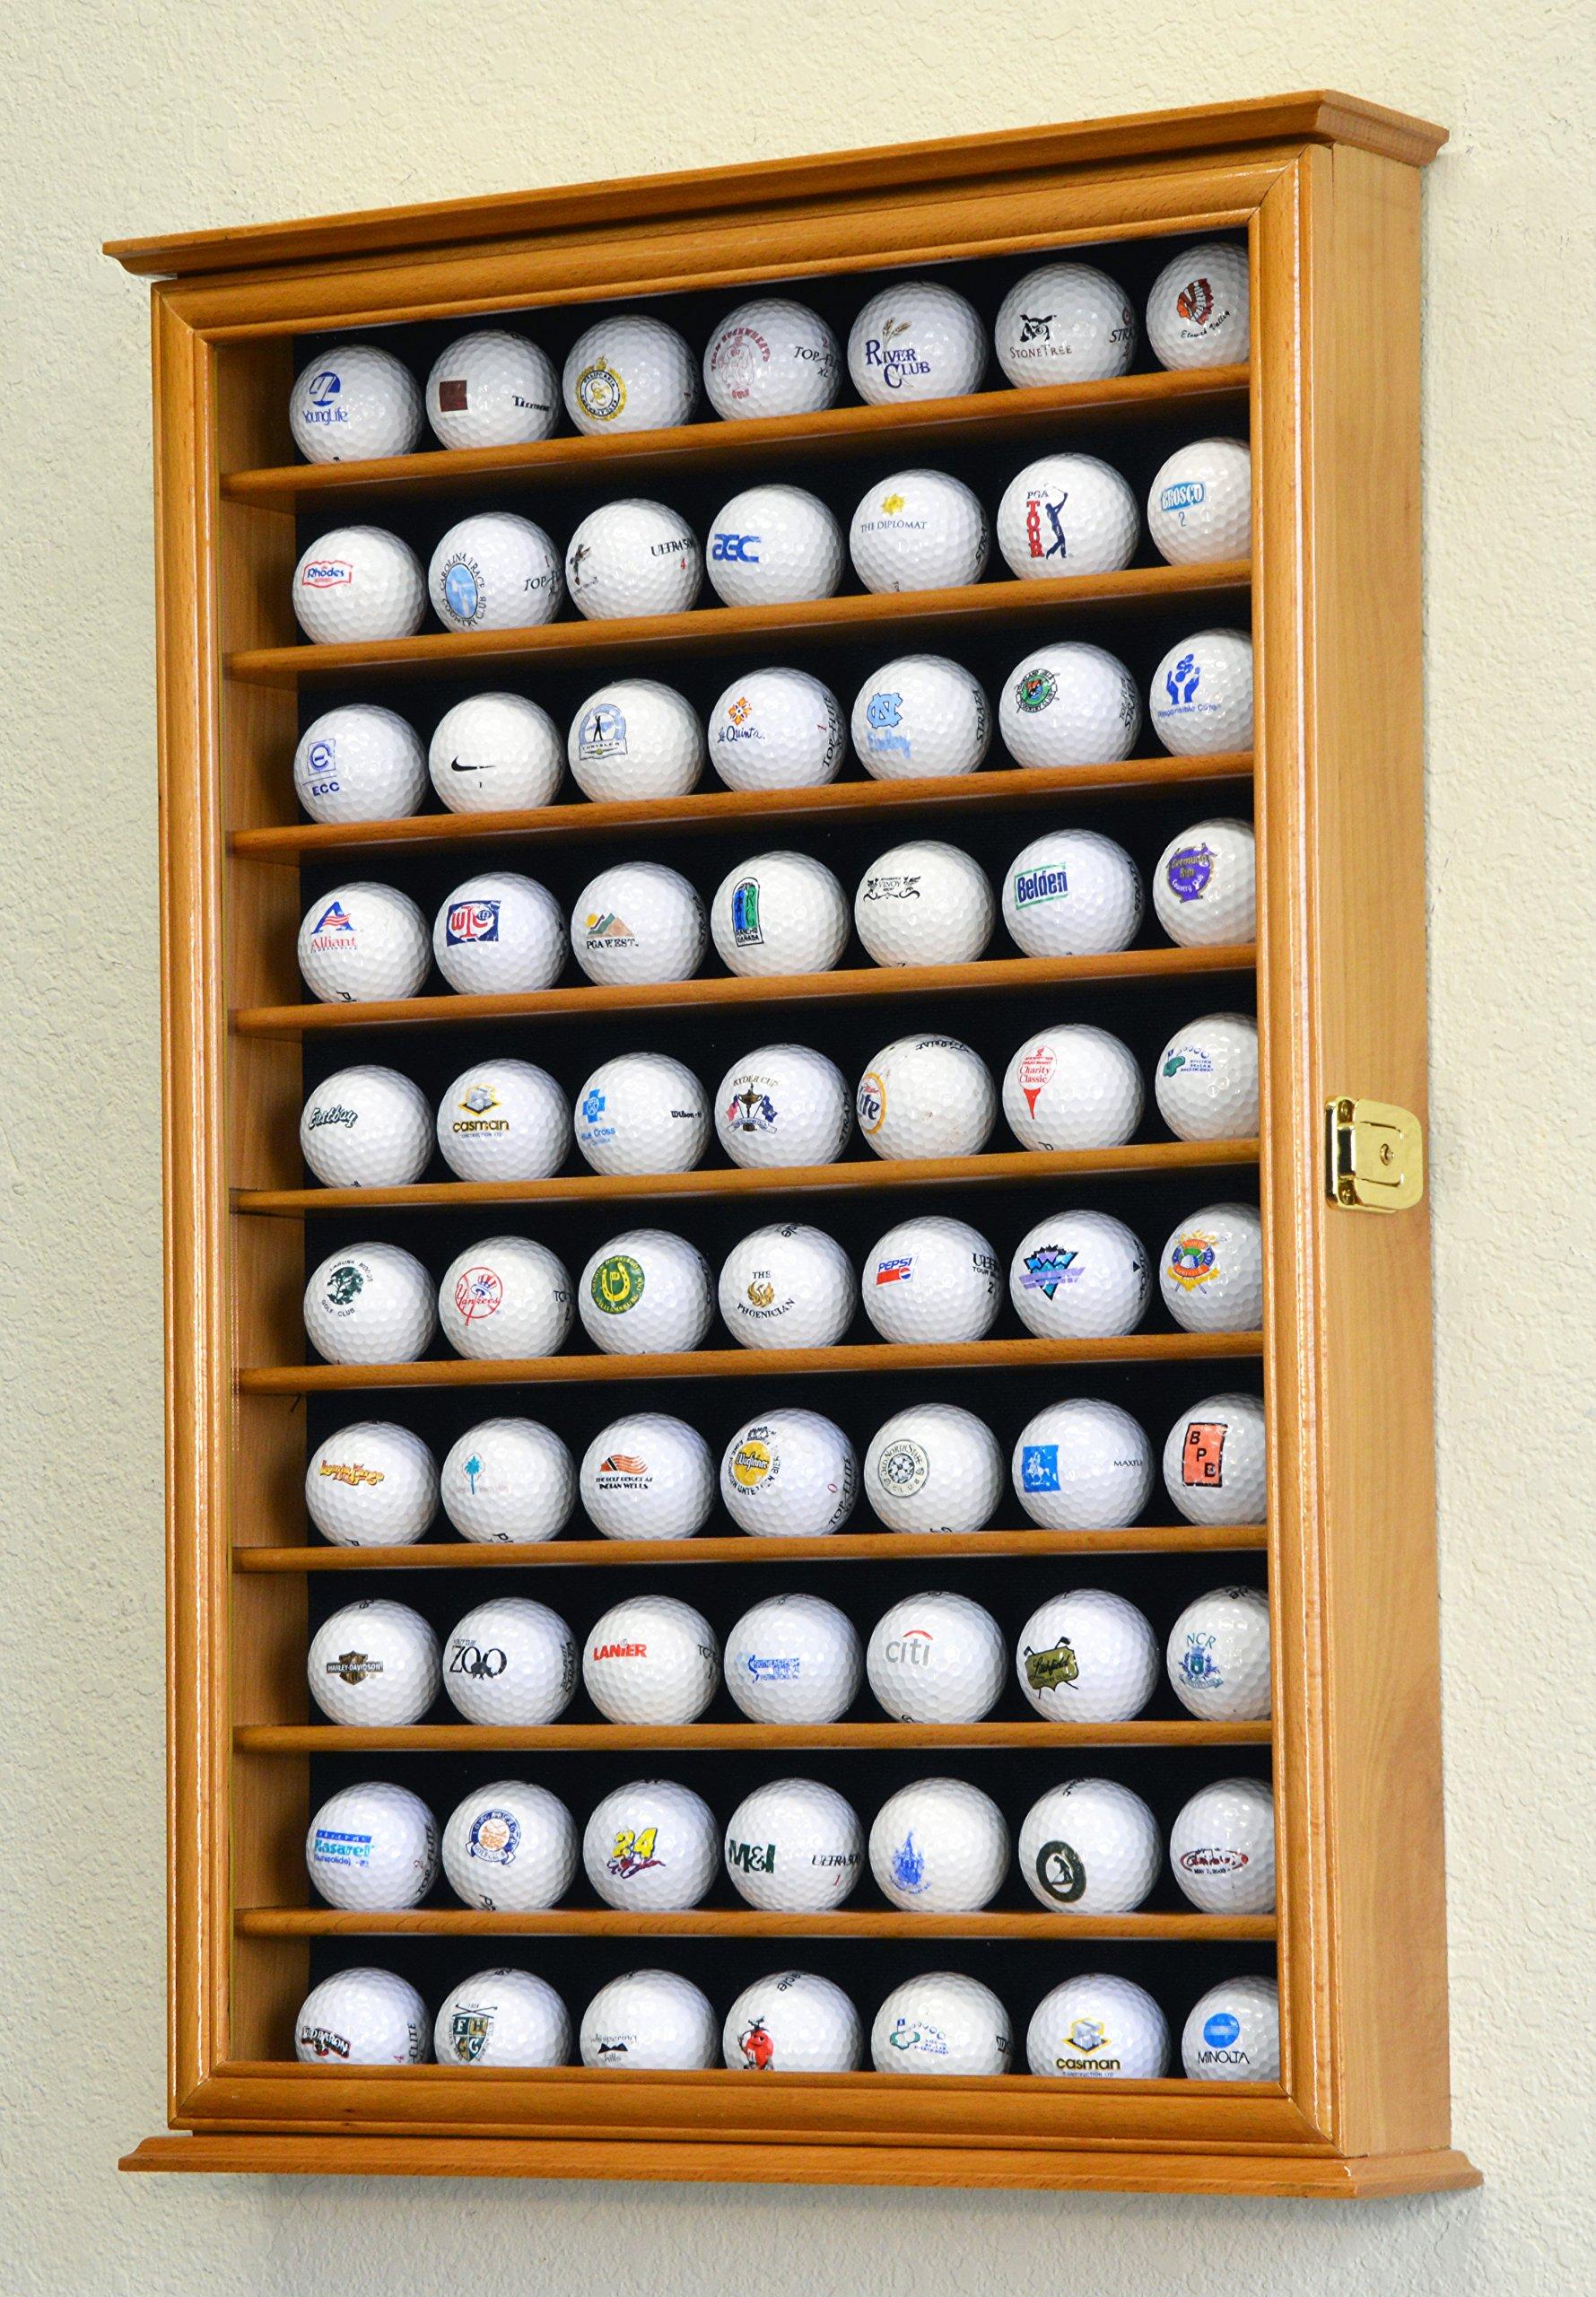 70 Golf Ball Display Case Cabinet Holder Wall Rack w/ UV Protection -Oak by sfDisplay (Image #1)